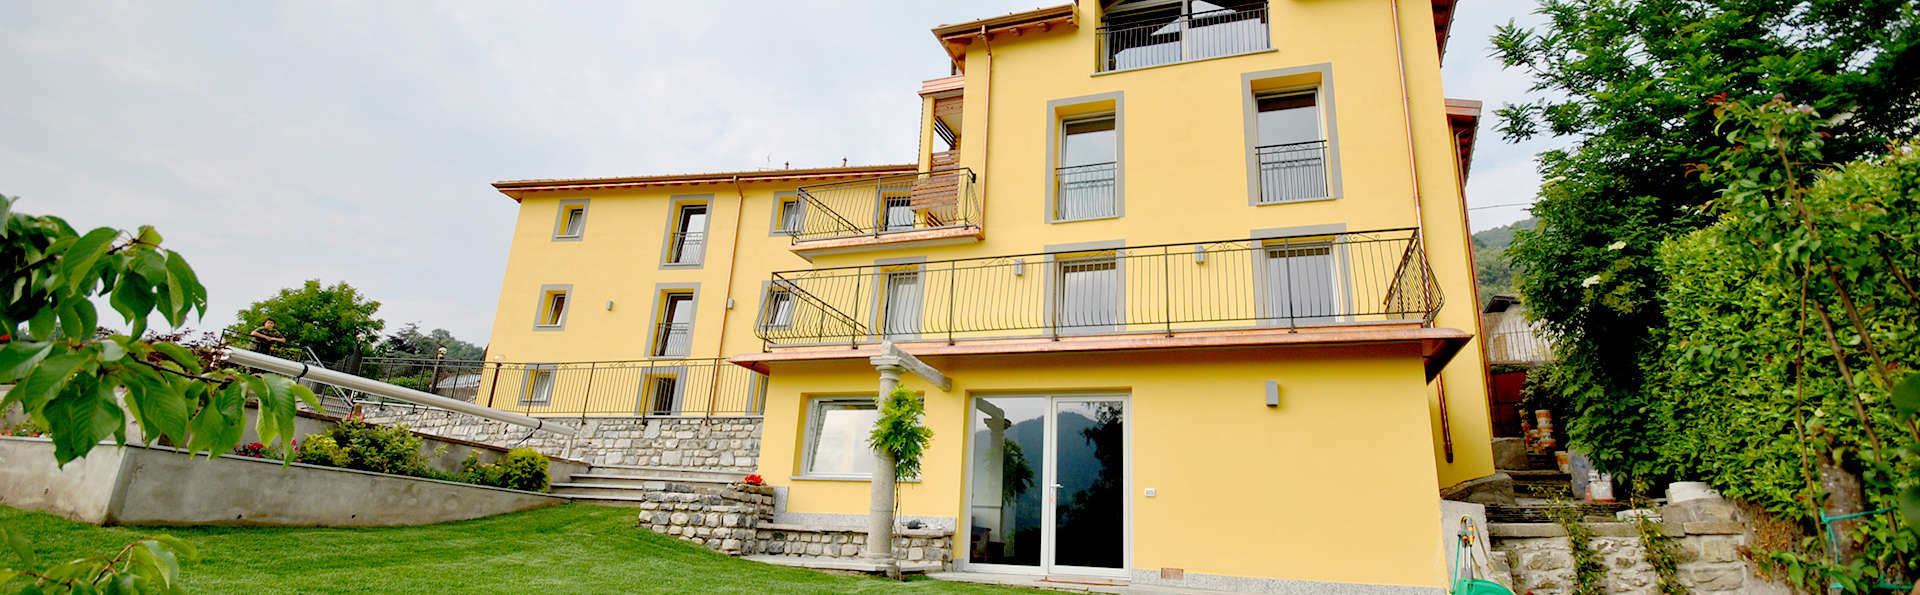 Hotel Corte di Santa Libera - edit_front2.jpg